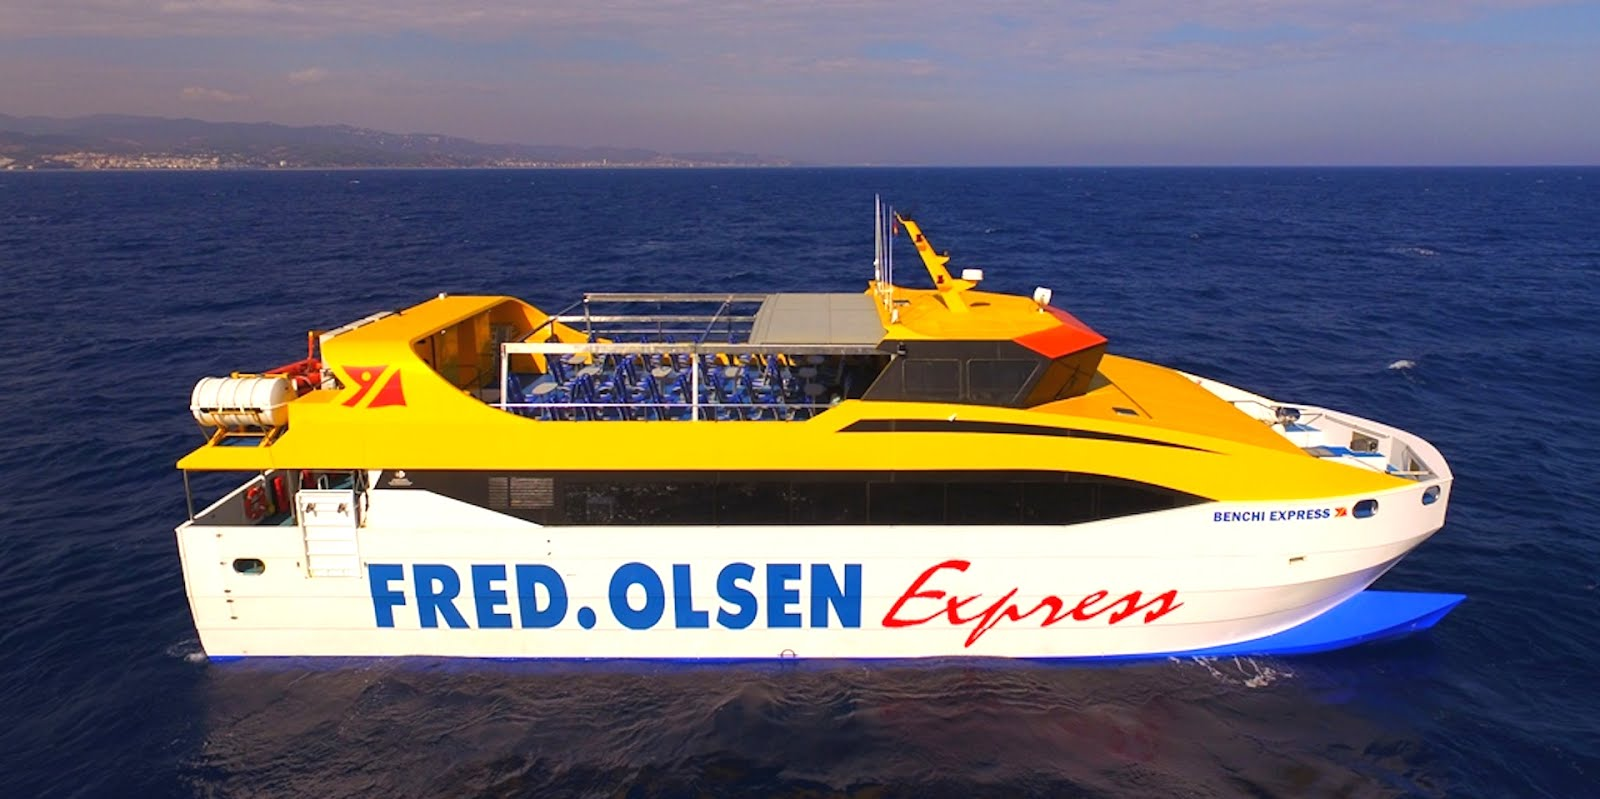 Canary Island Ferry Service